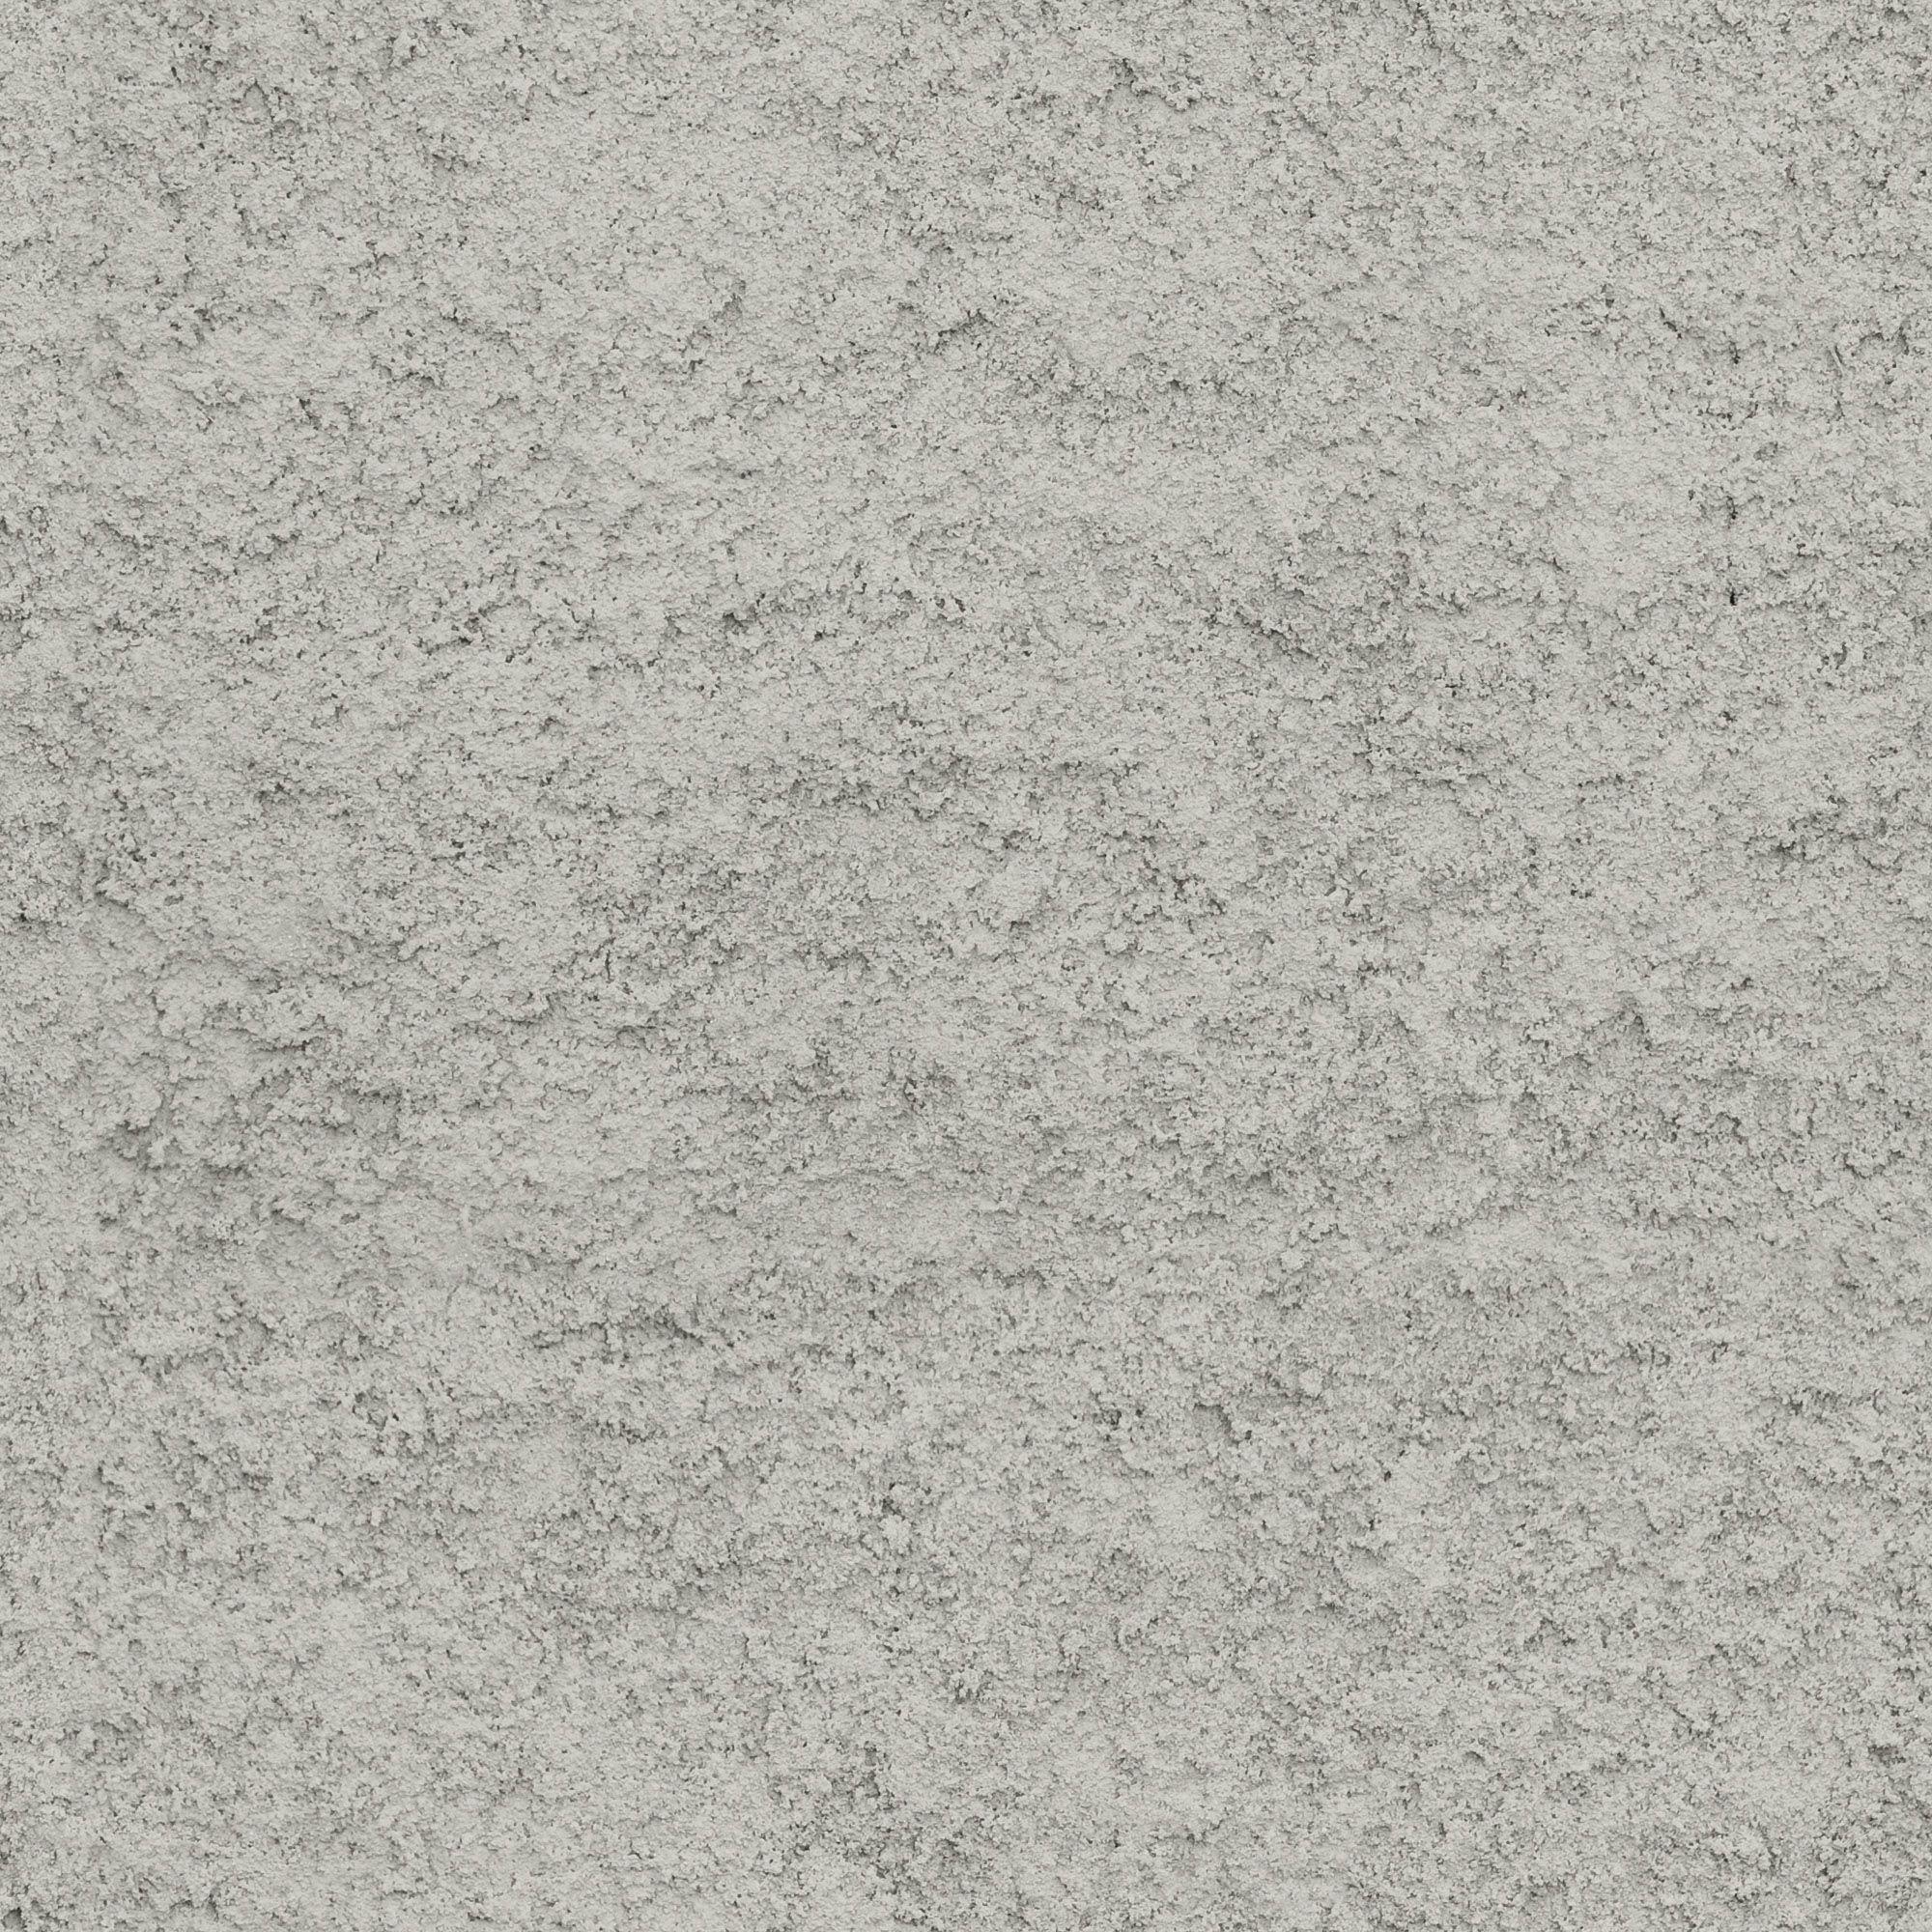 Concrete Wall Texture High 2000 2000 Textures